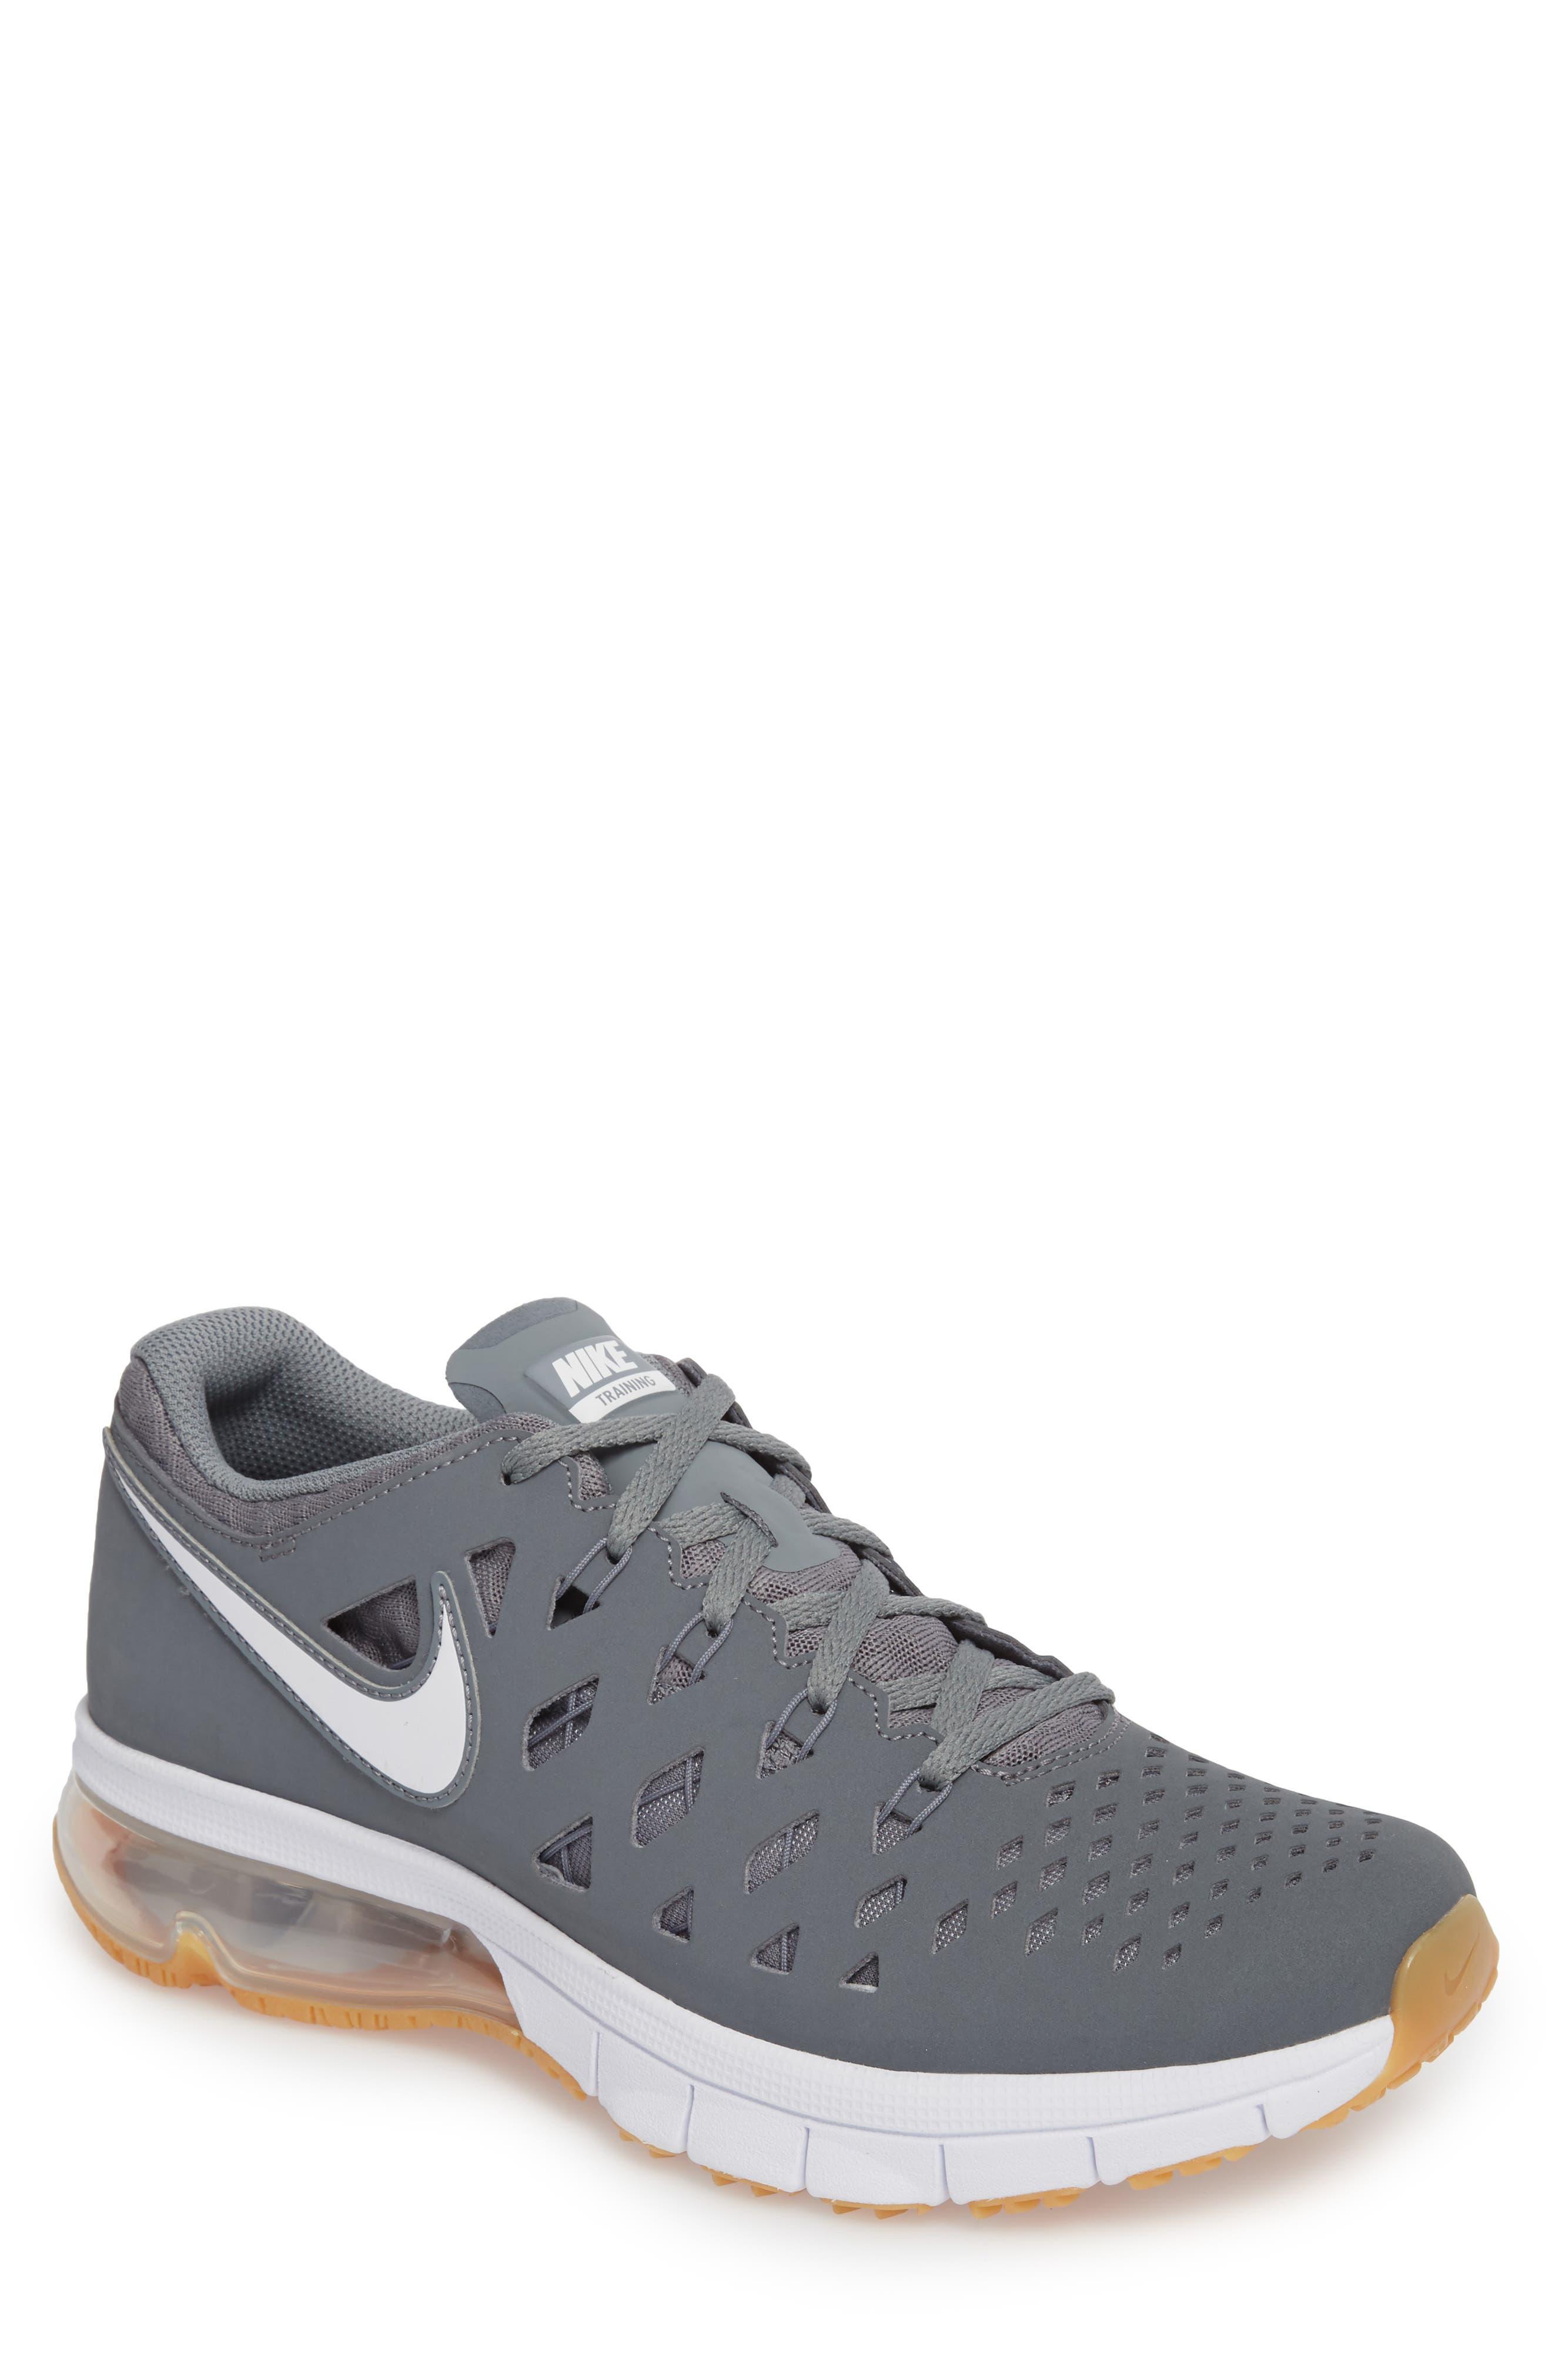 Main Image - Nike Air Trainer 180 Training Shoe (Men)